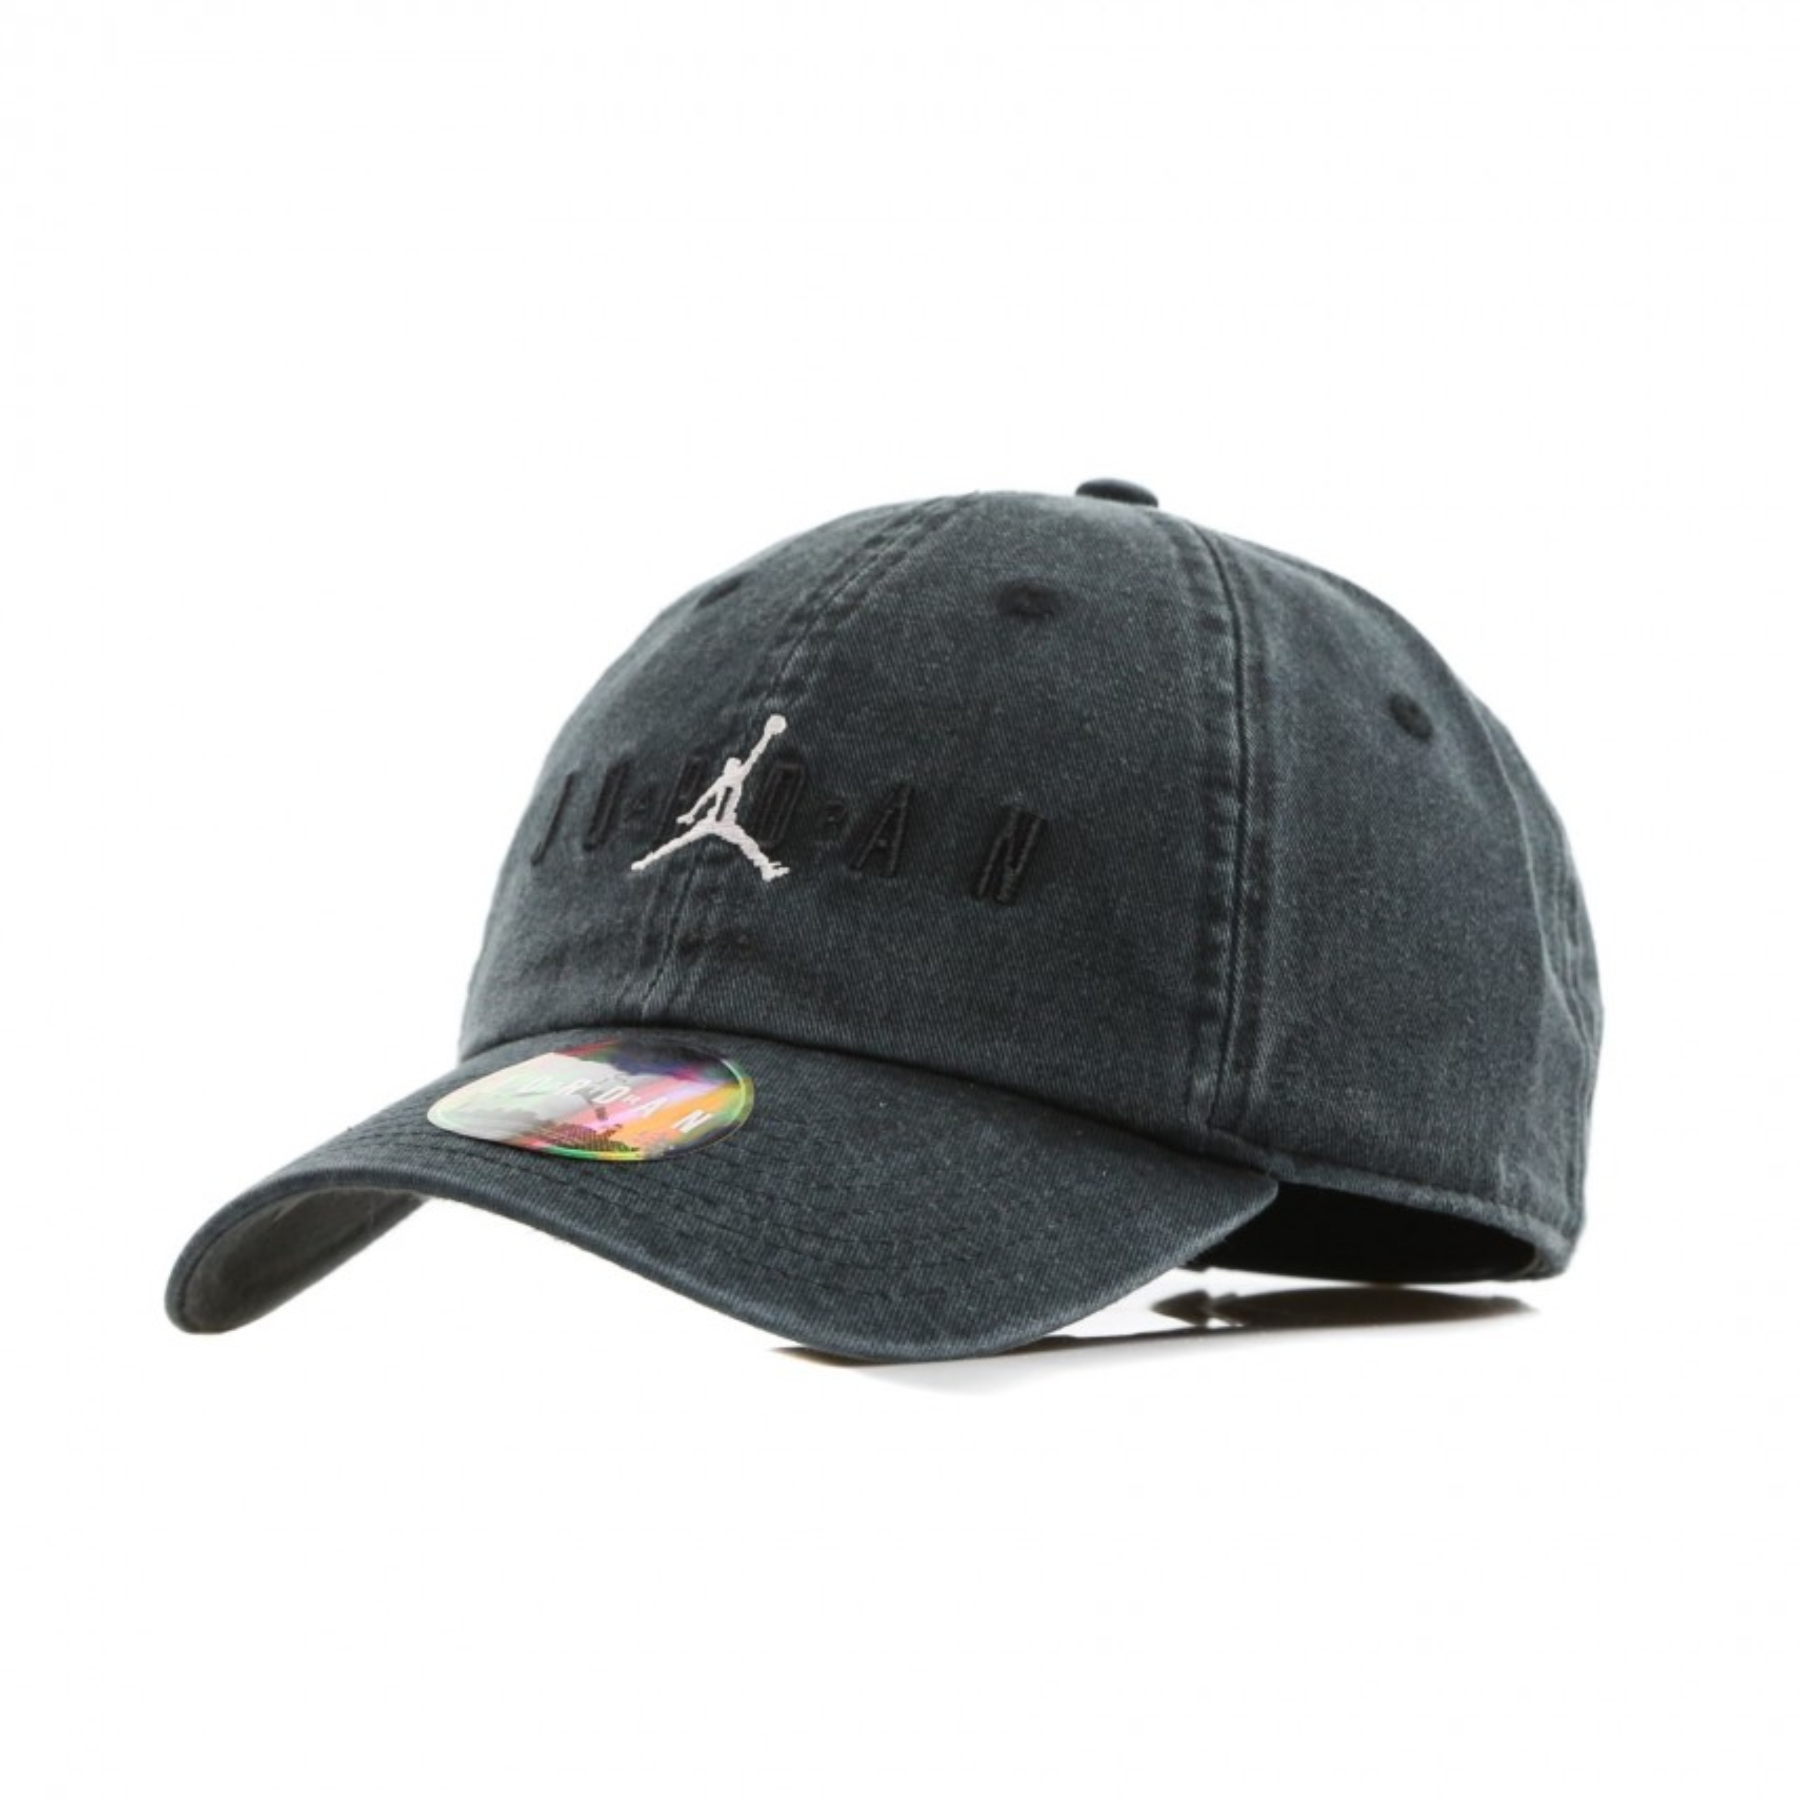 Cappello Visiera Curva Jordan H86 Air Cap Black Smoke Grey